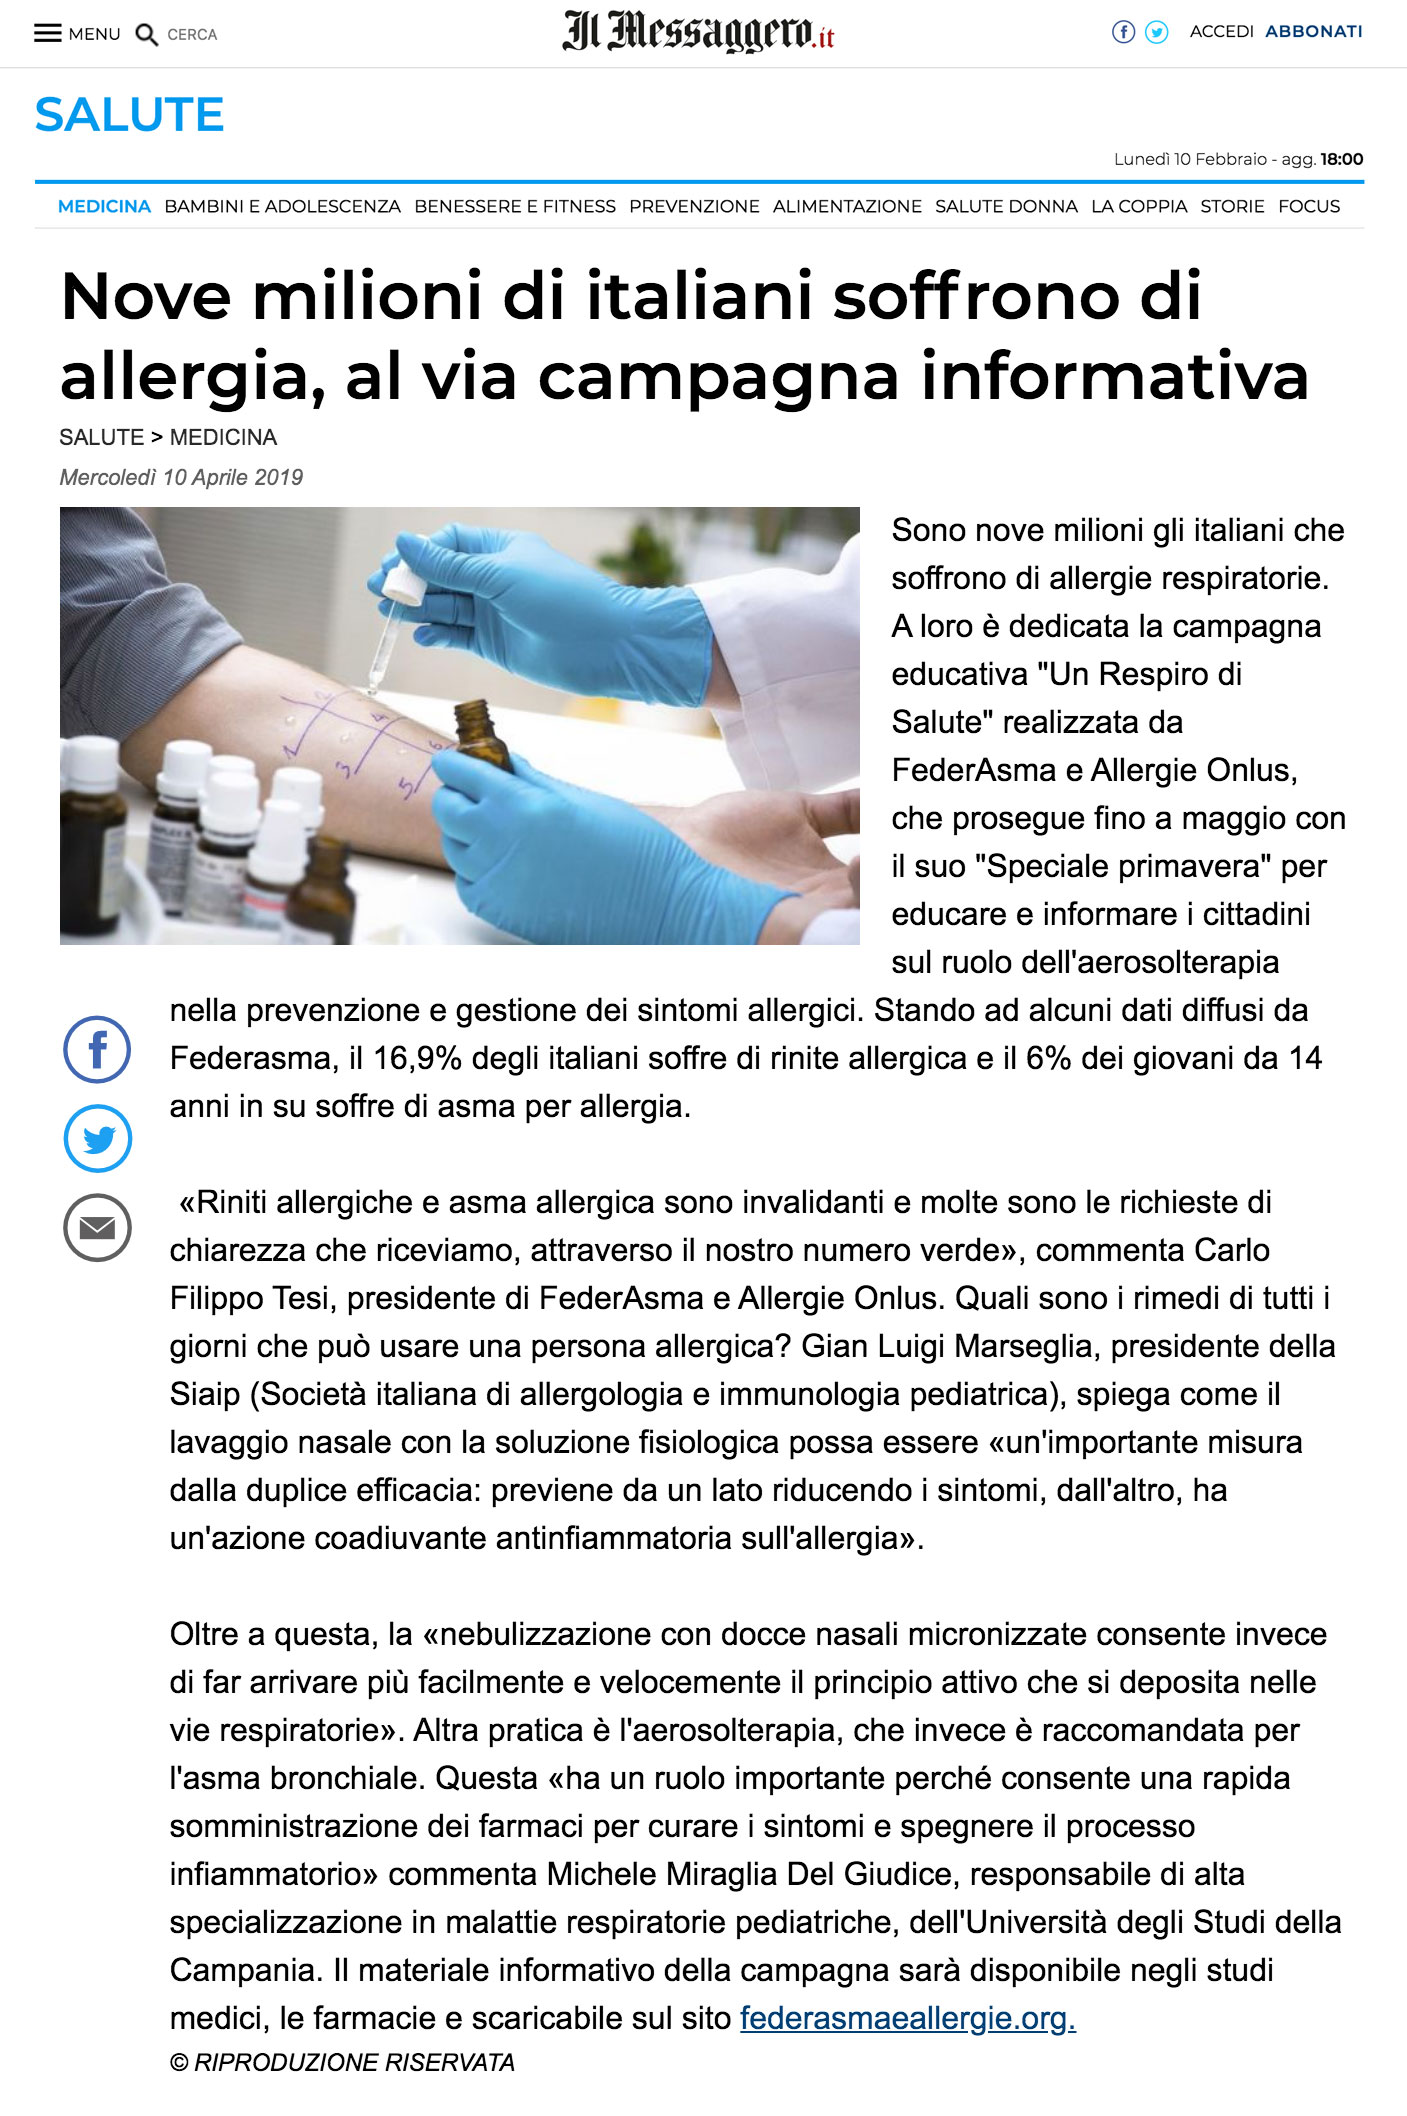 notizie messaggero allergia